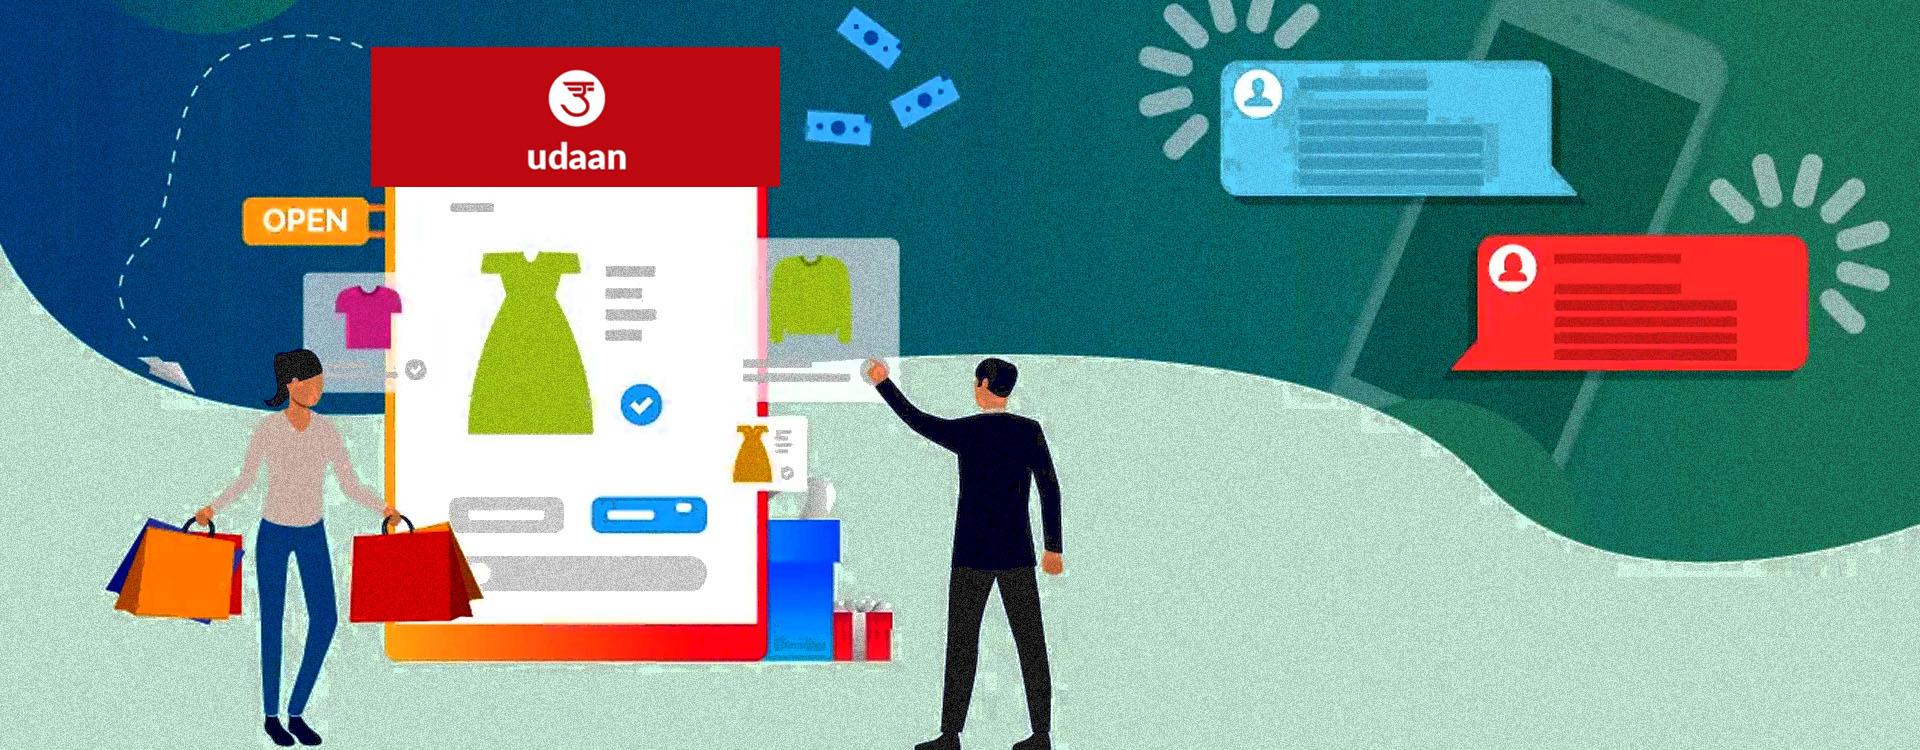 B2B E-Commerce Unicorn Start-up Udaan Lifestyle Growth